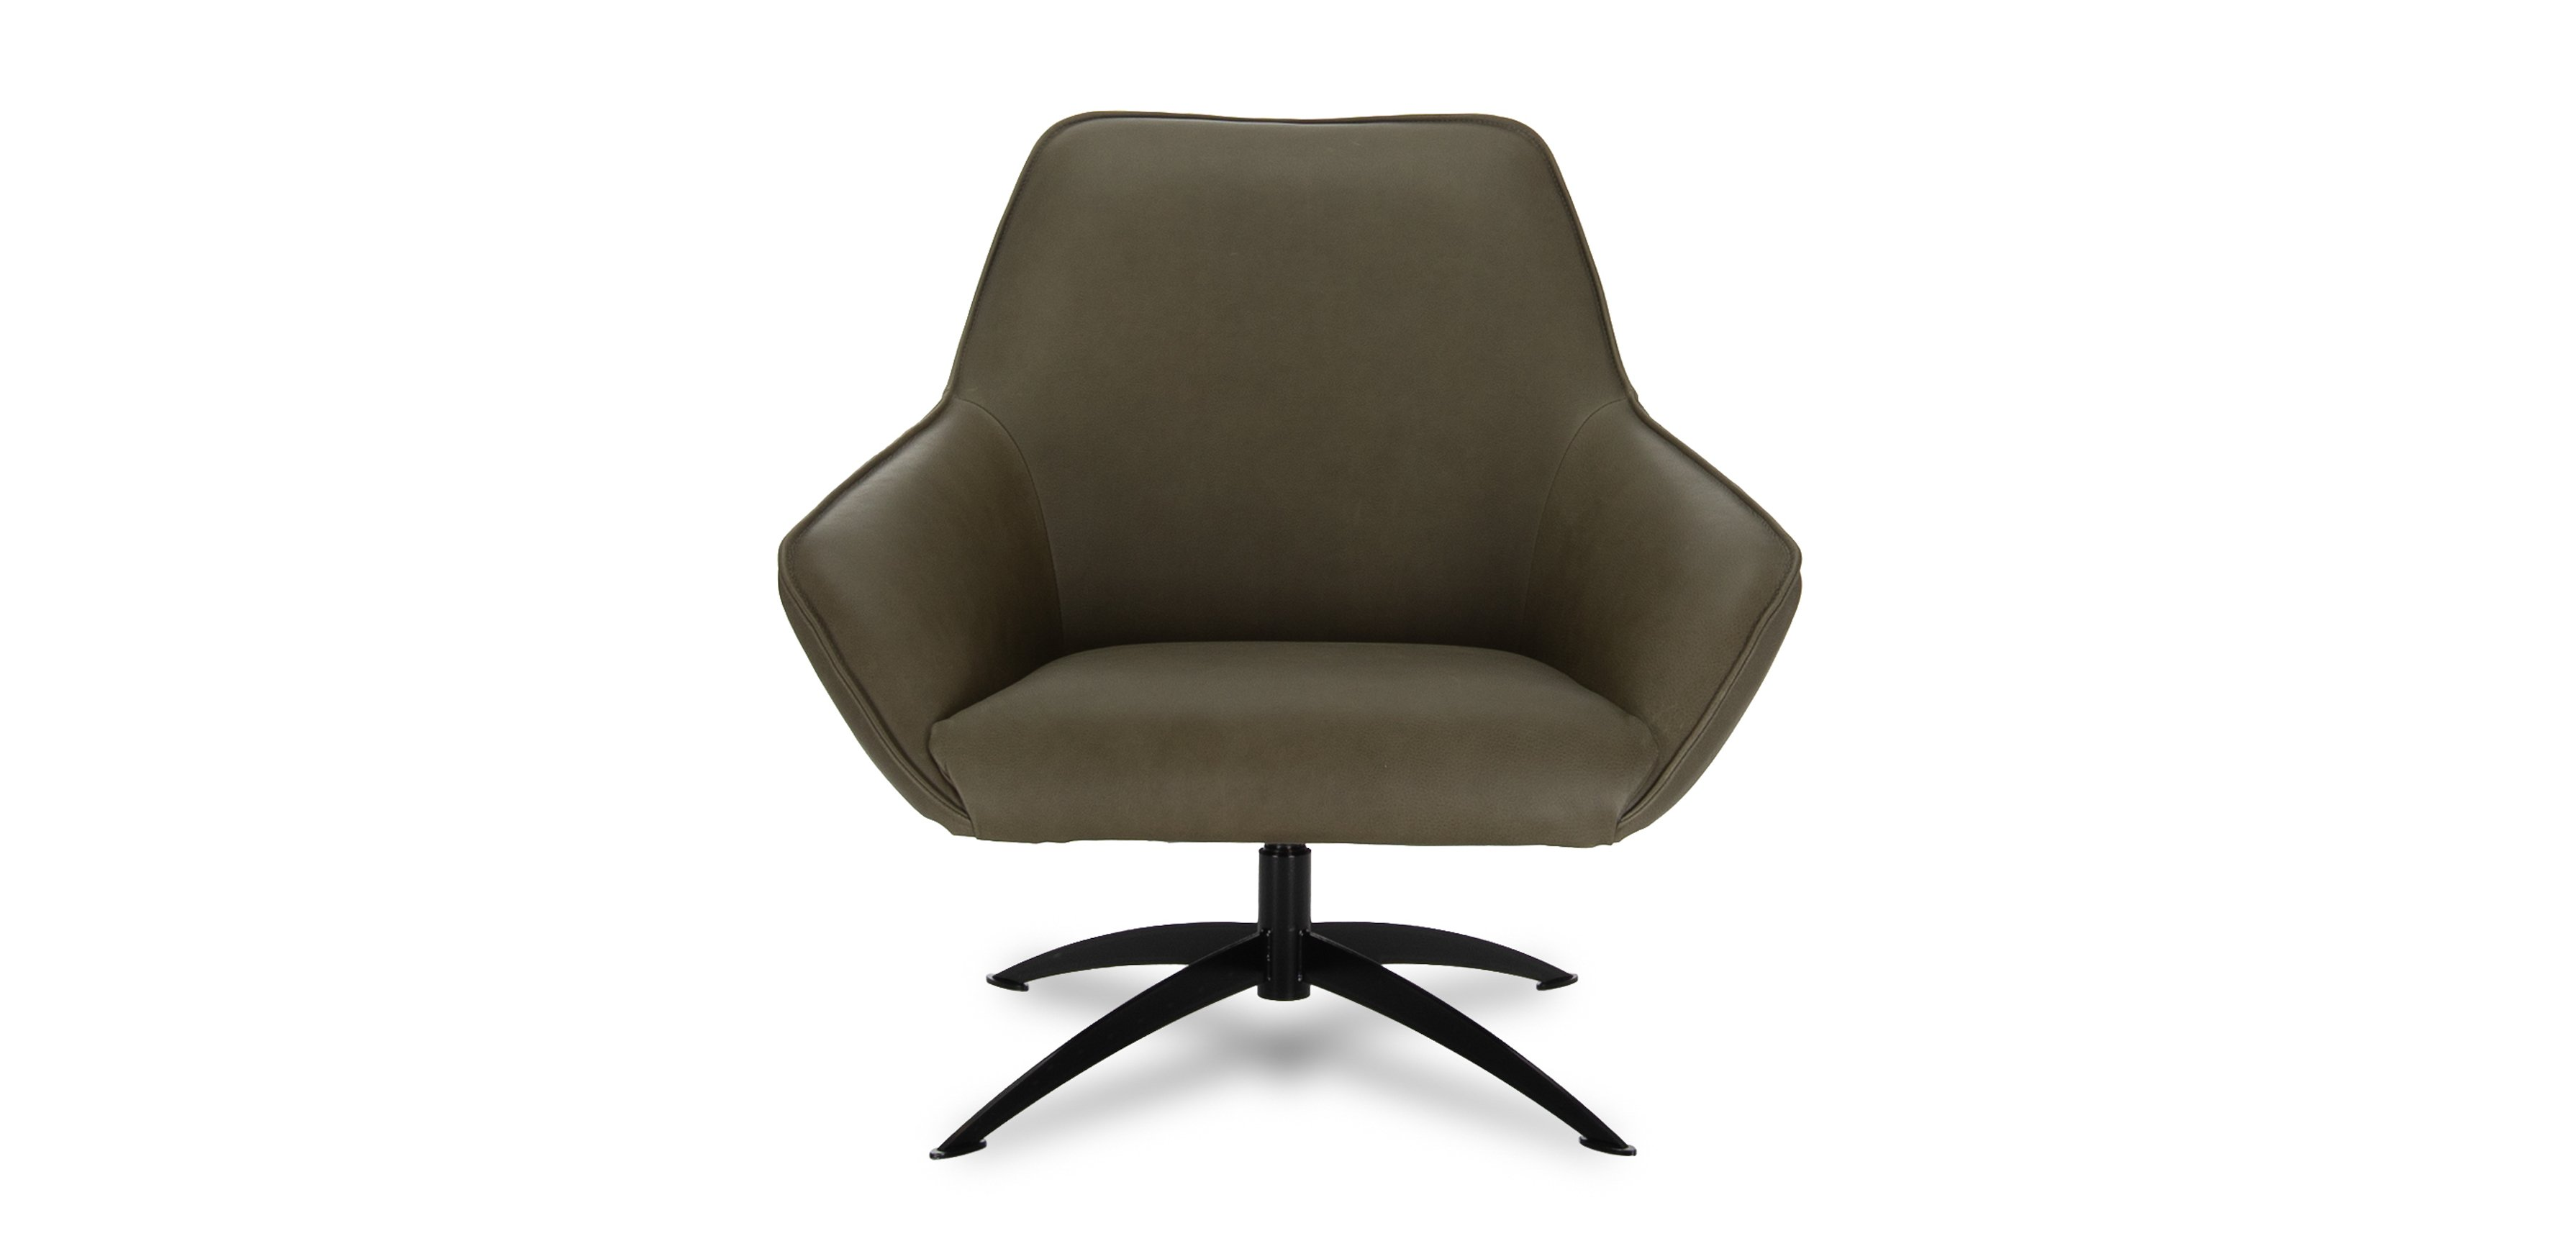 Faas fauteuil DYYK 3580x1750 leer 1